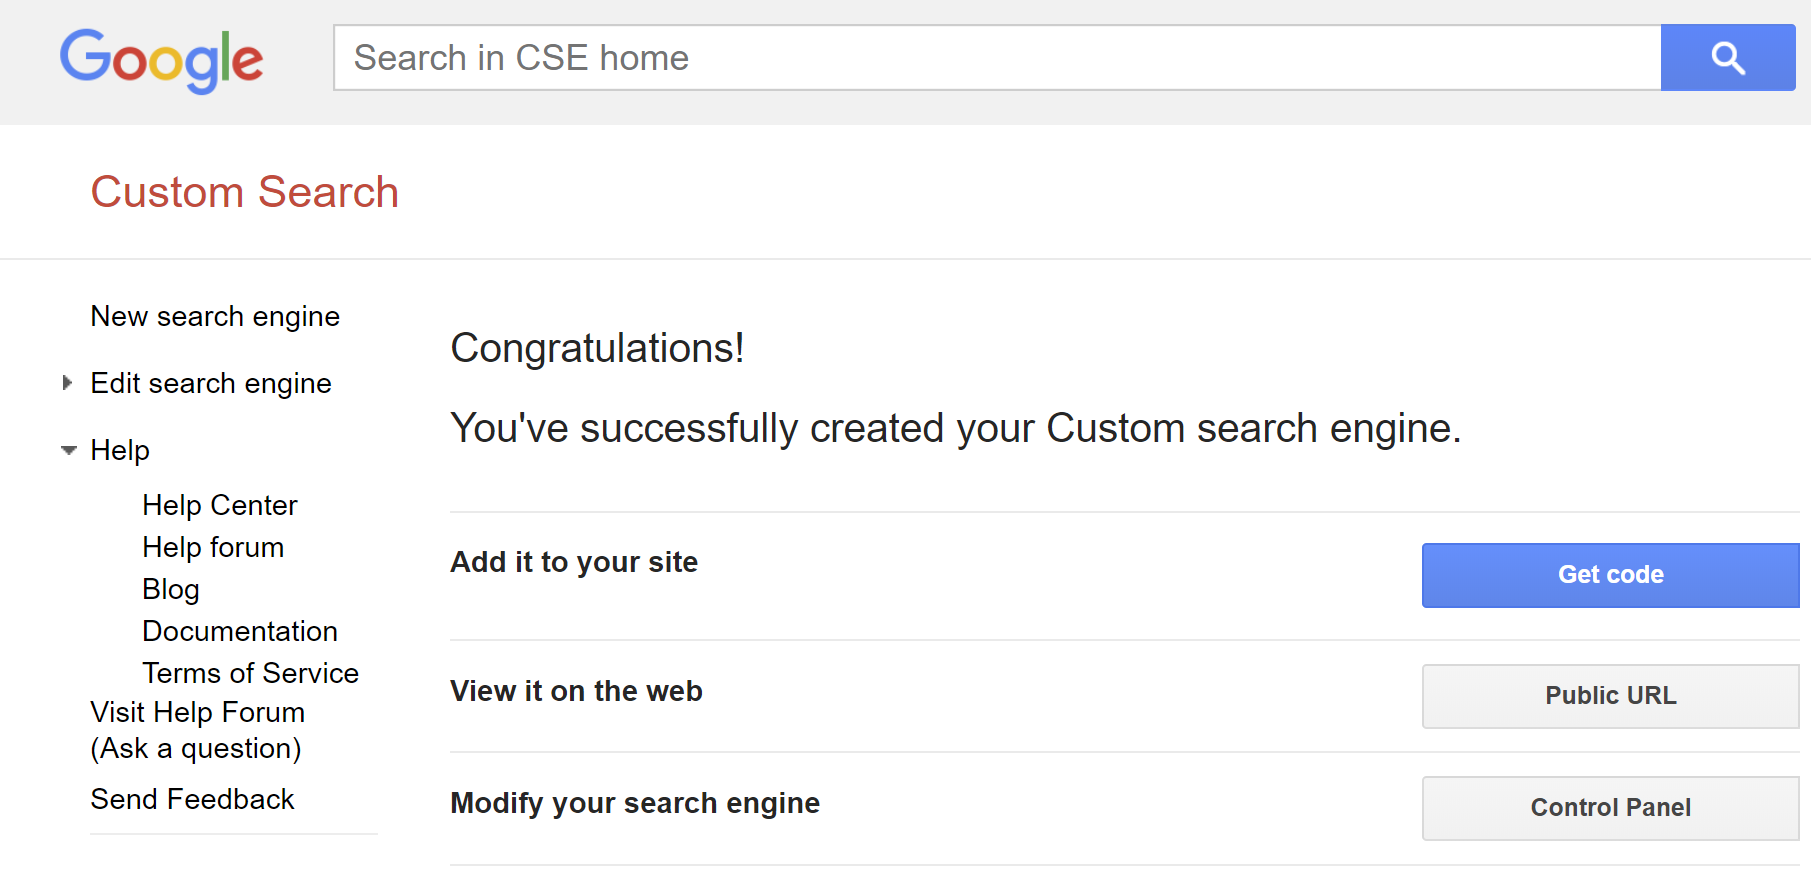 Adding Google Custom Search to Casper